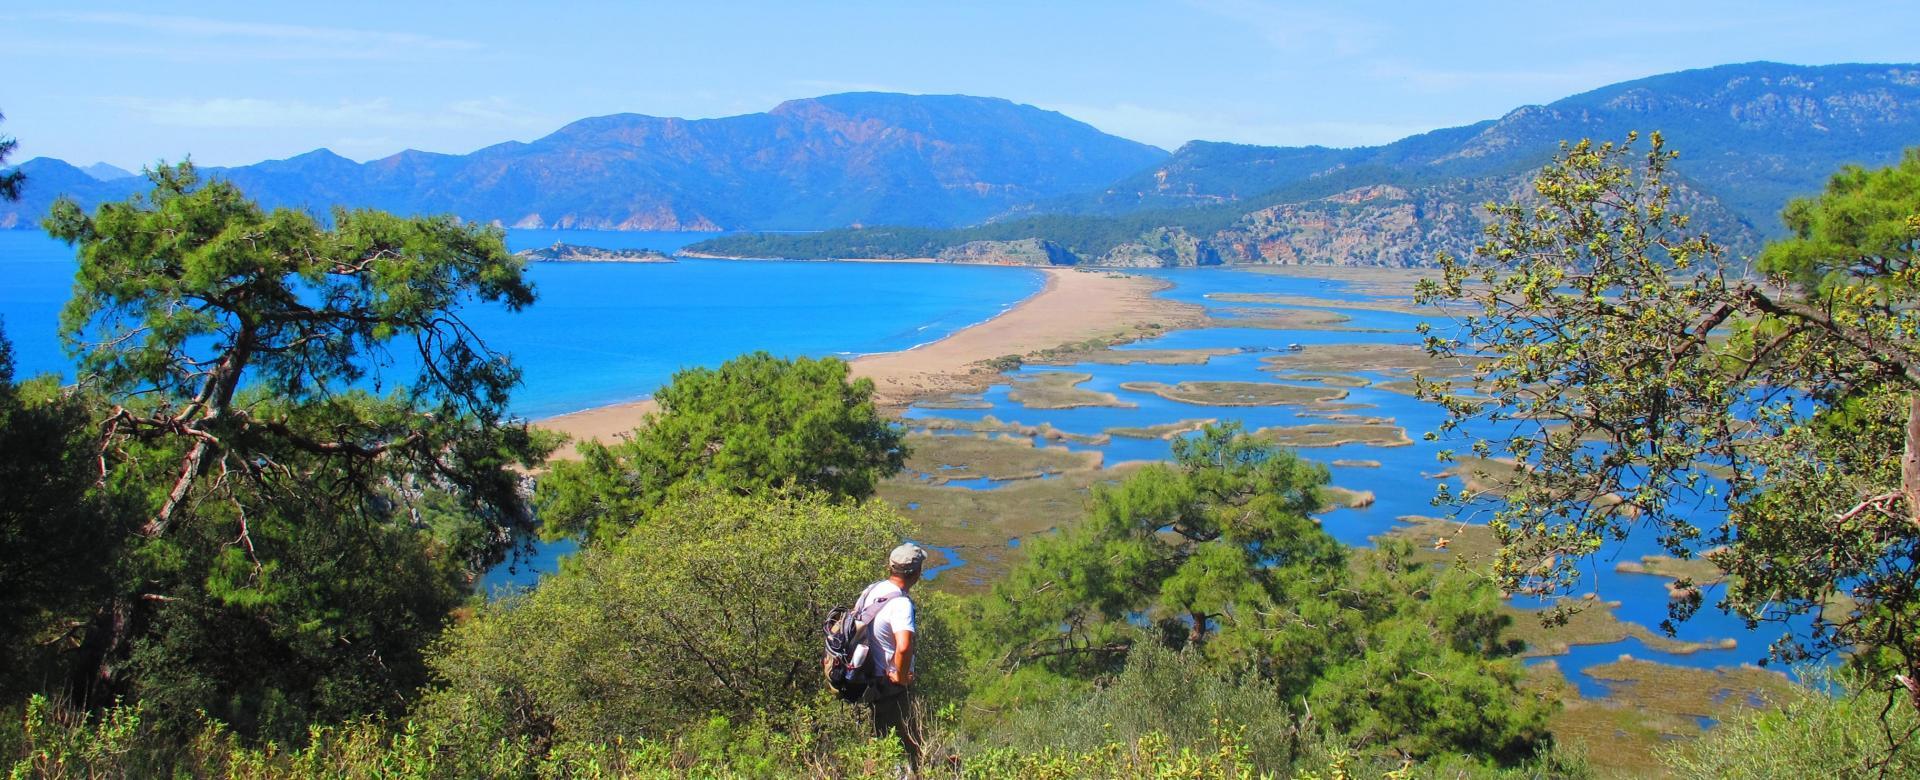 Voyage à pied : Turquie : Lycian way